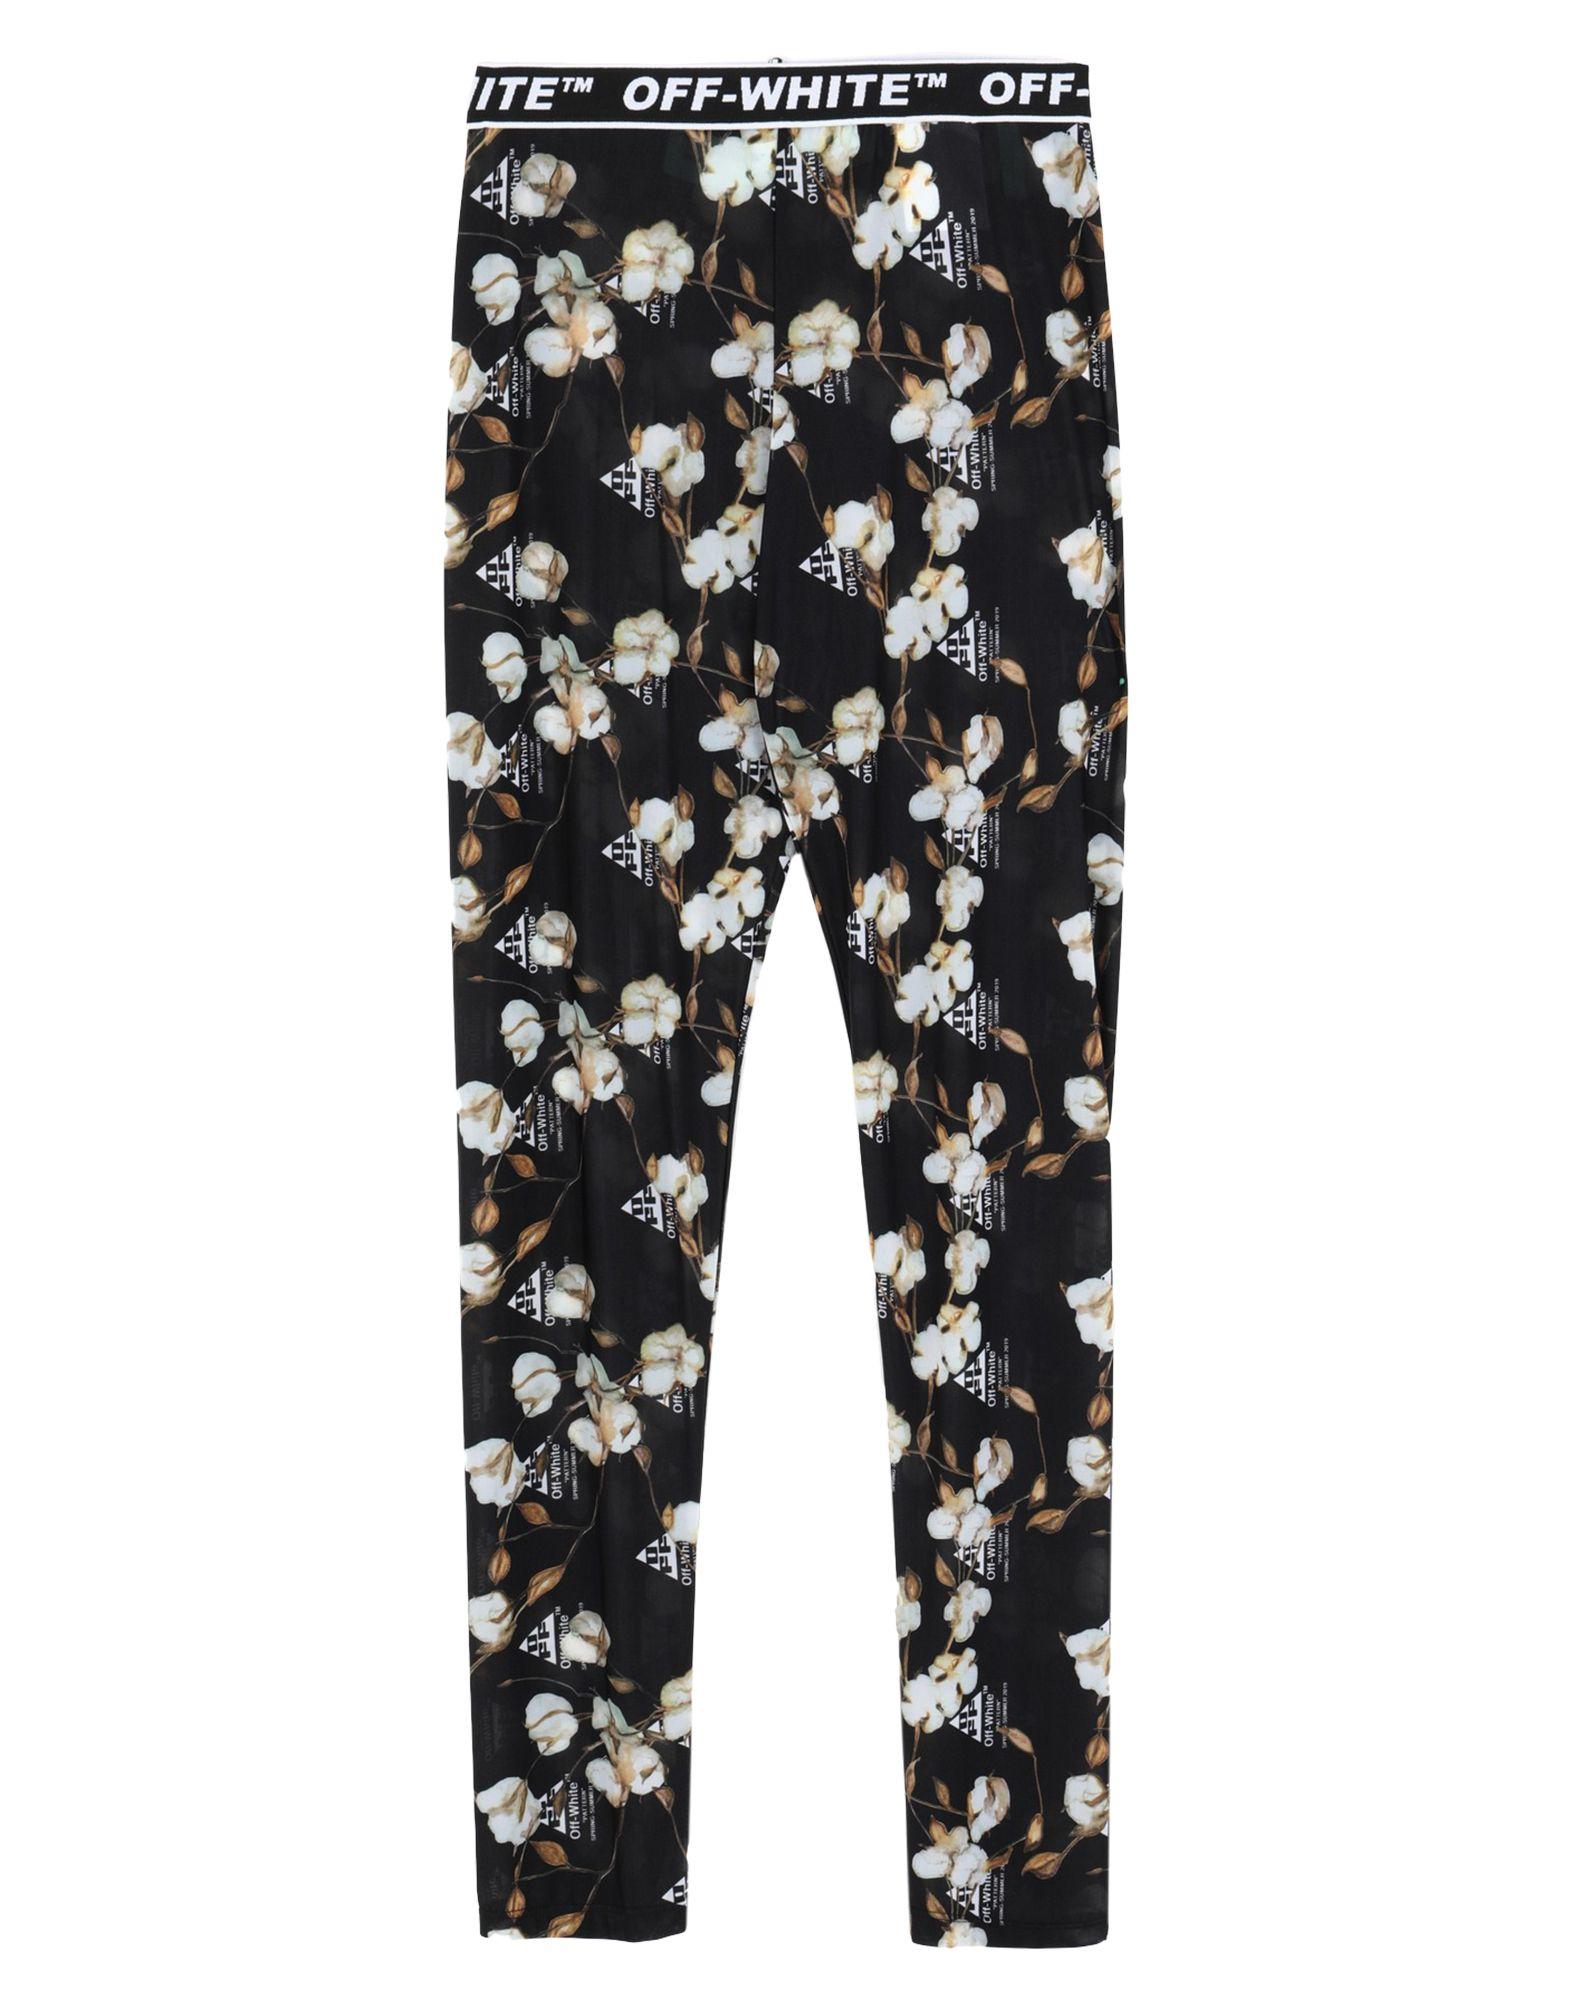 OFF-WHITE™ Leggings. jersey, logo, floral design, mid rise, elasticized waist, stretch. 80% Polyamide, 20% Elastane